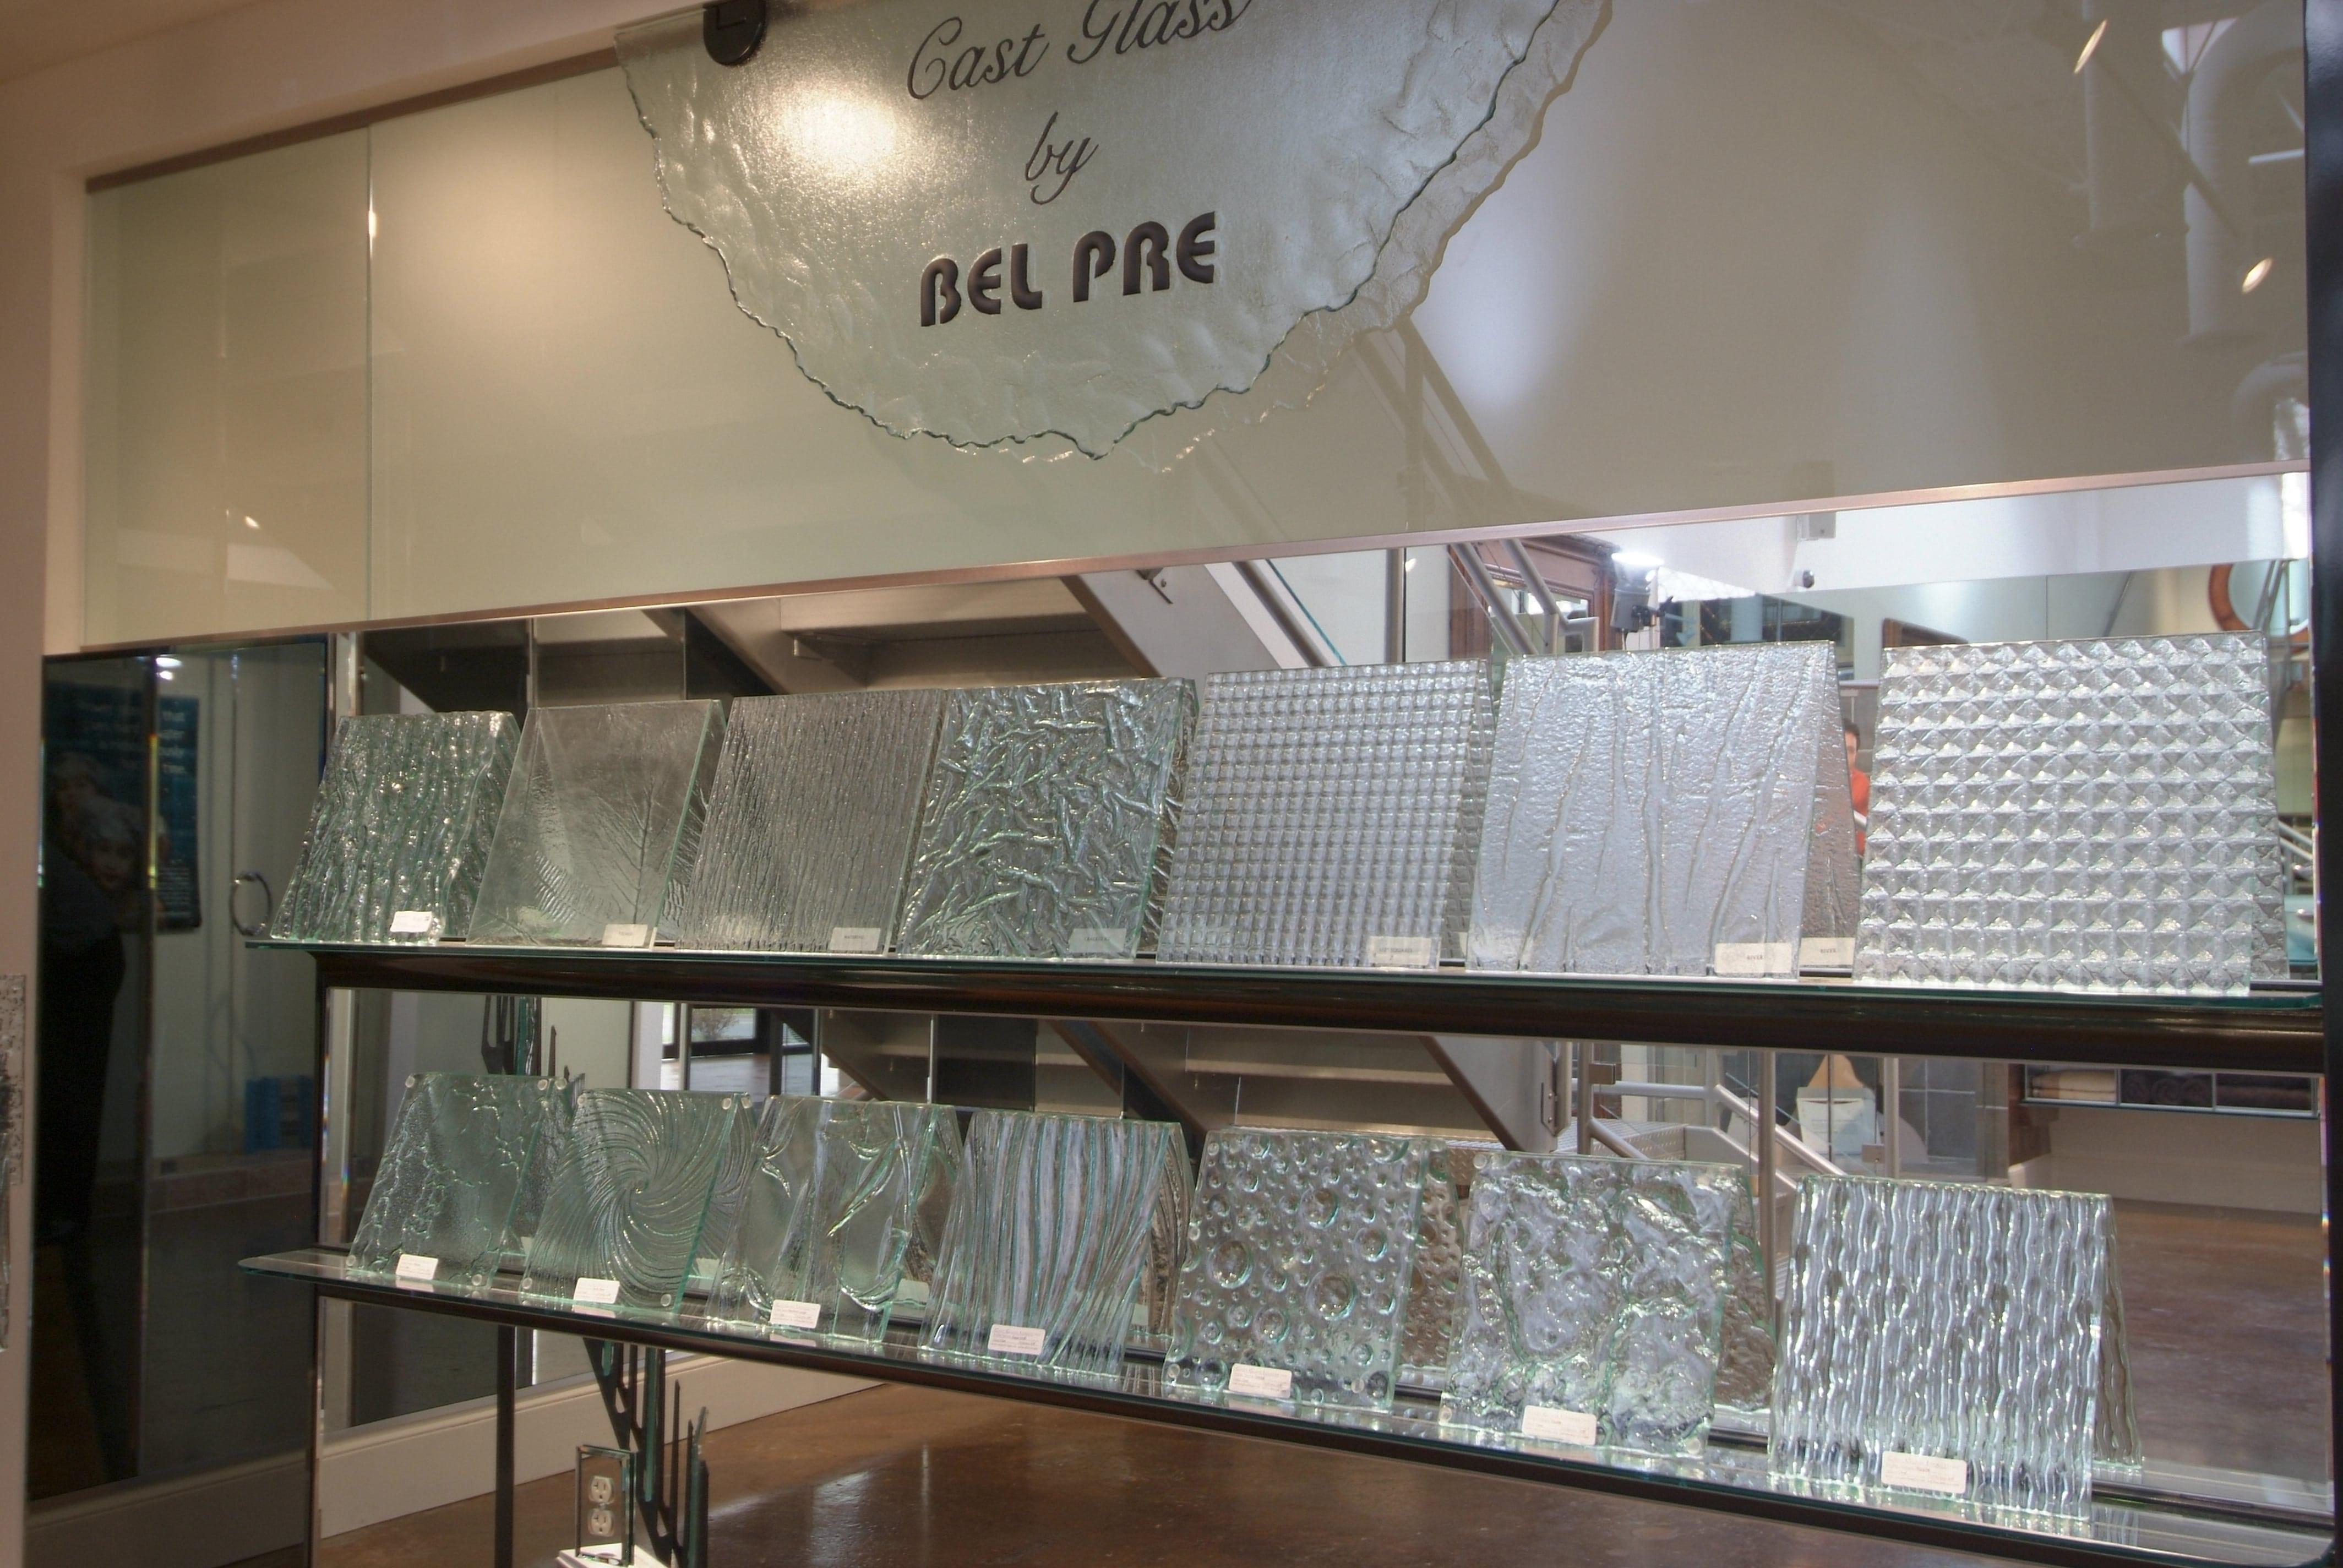 Showroom 23 - Cast Glass Display-min